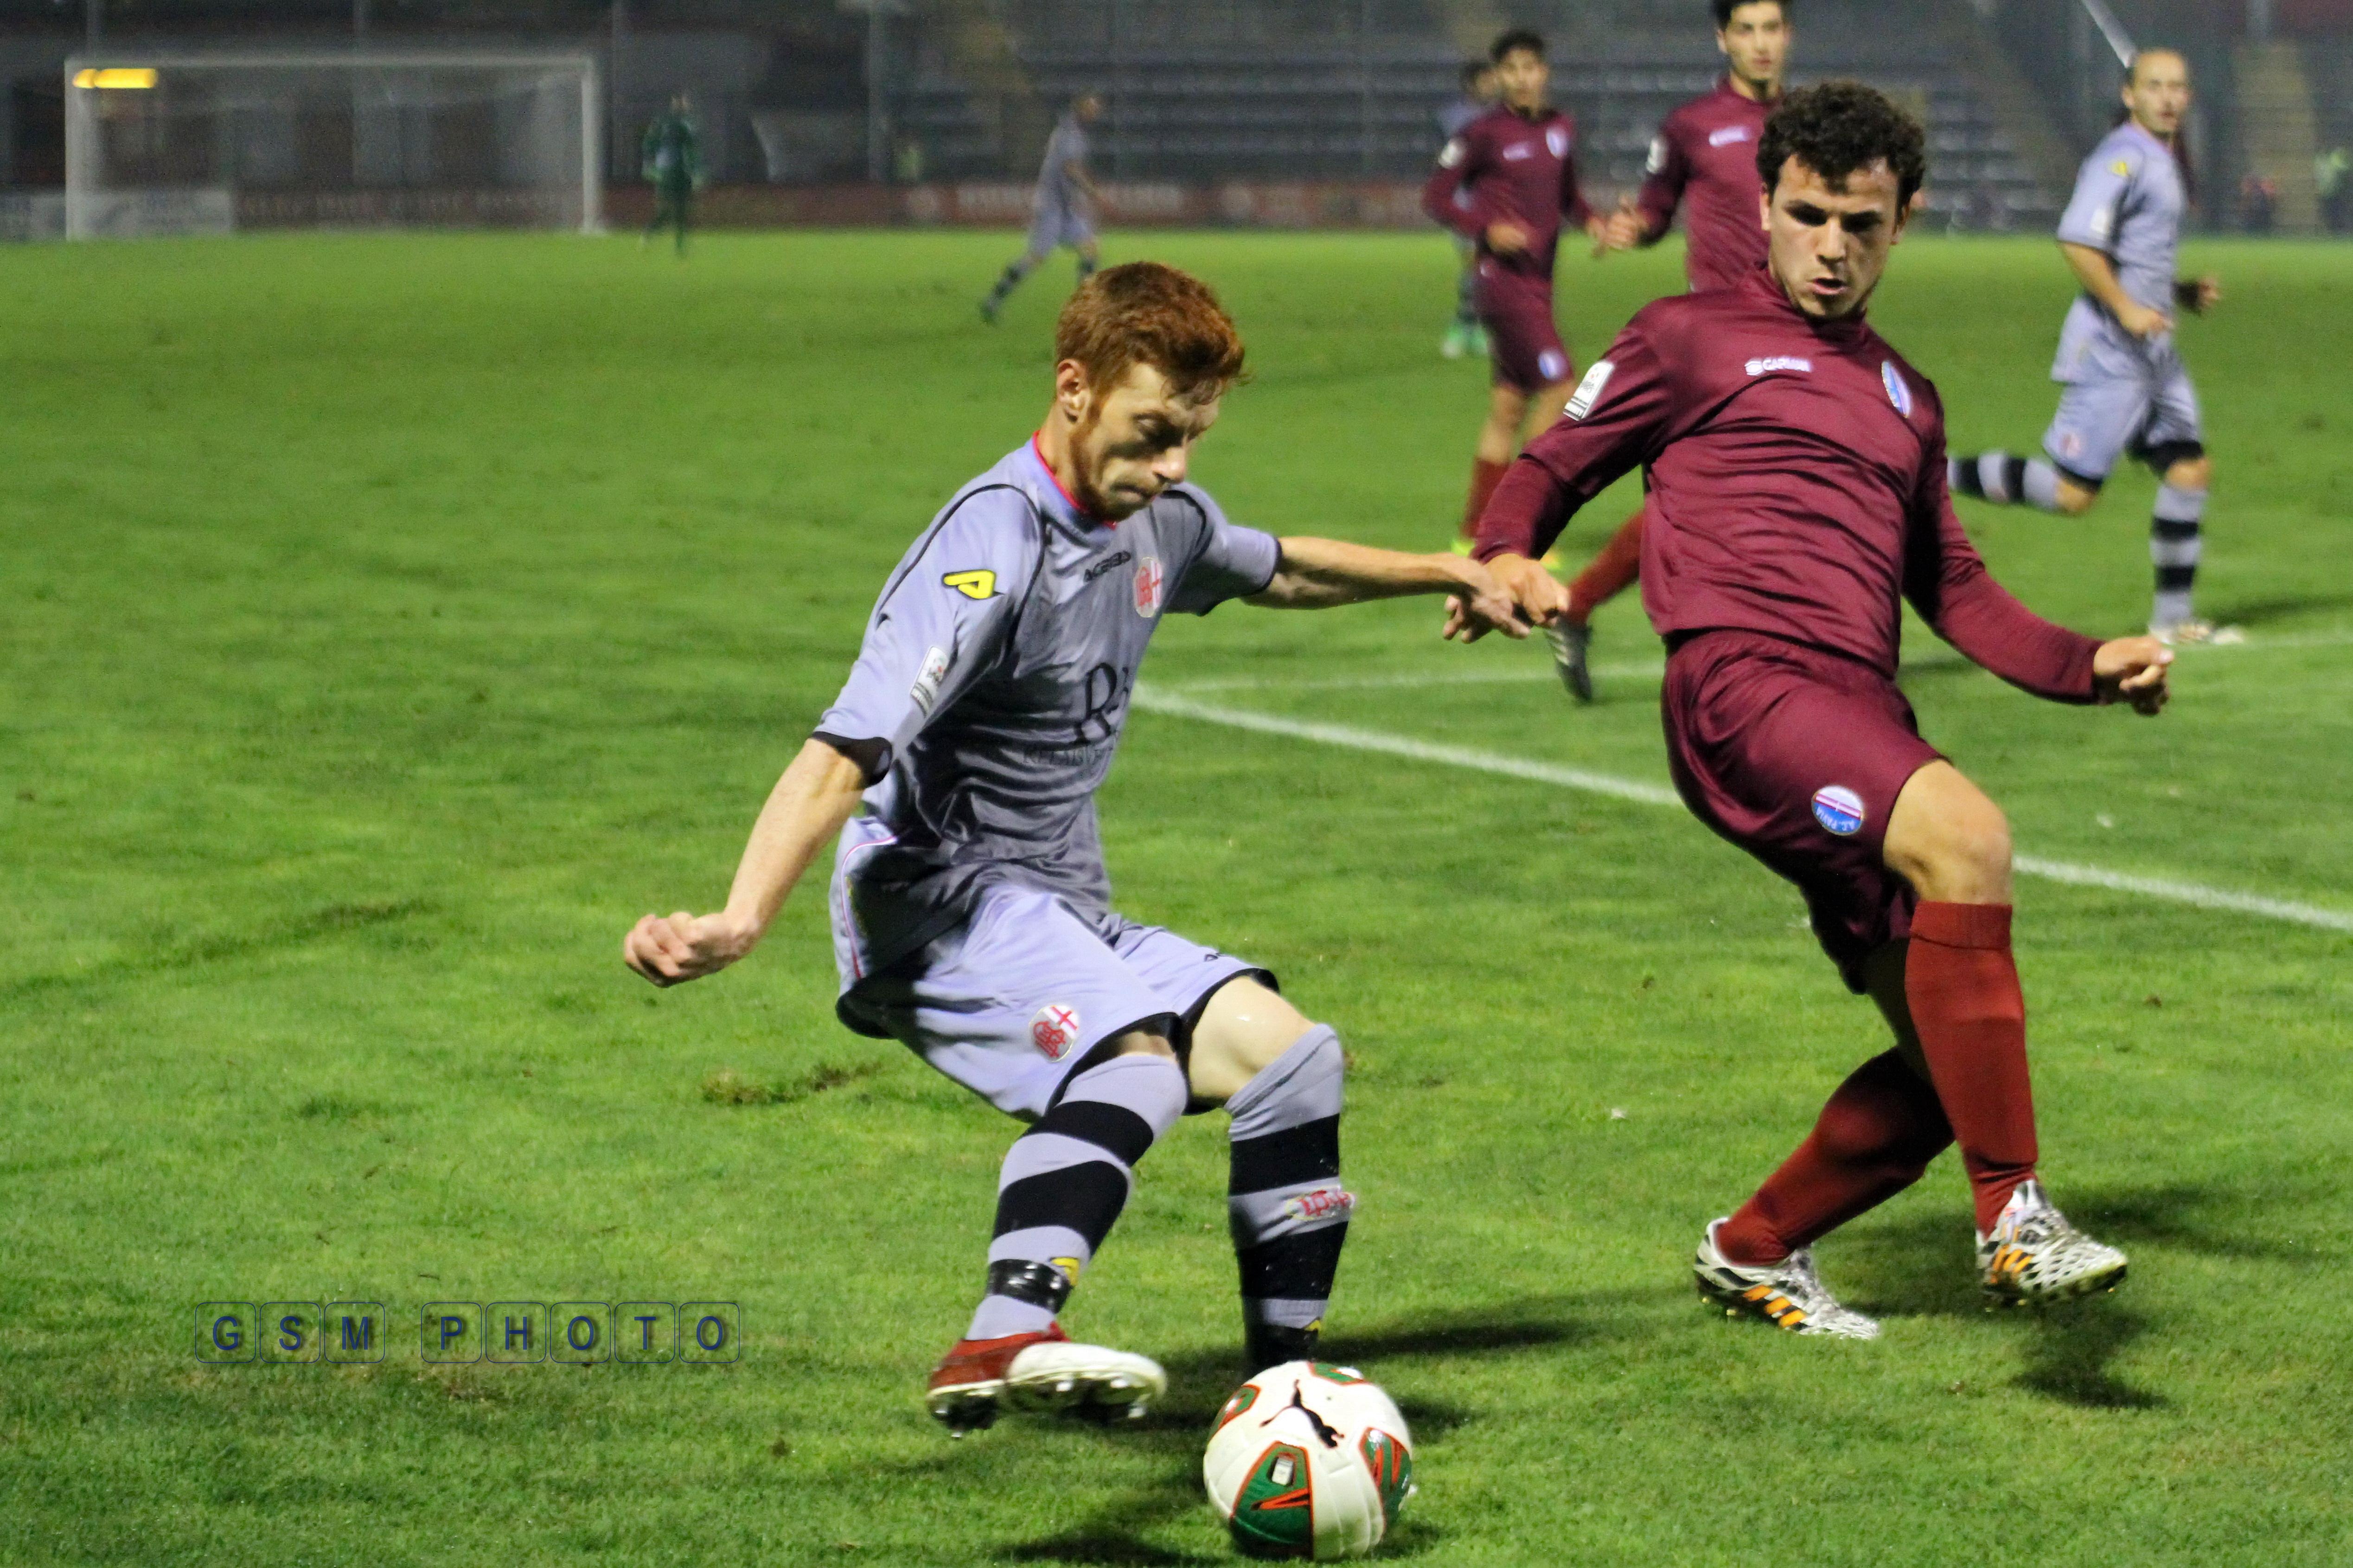 Alessandria-Pavia Coppa Italia_29_10_2014 (11)